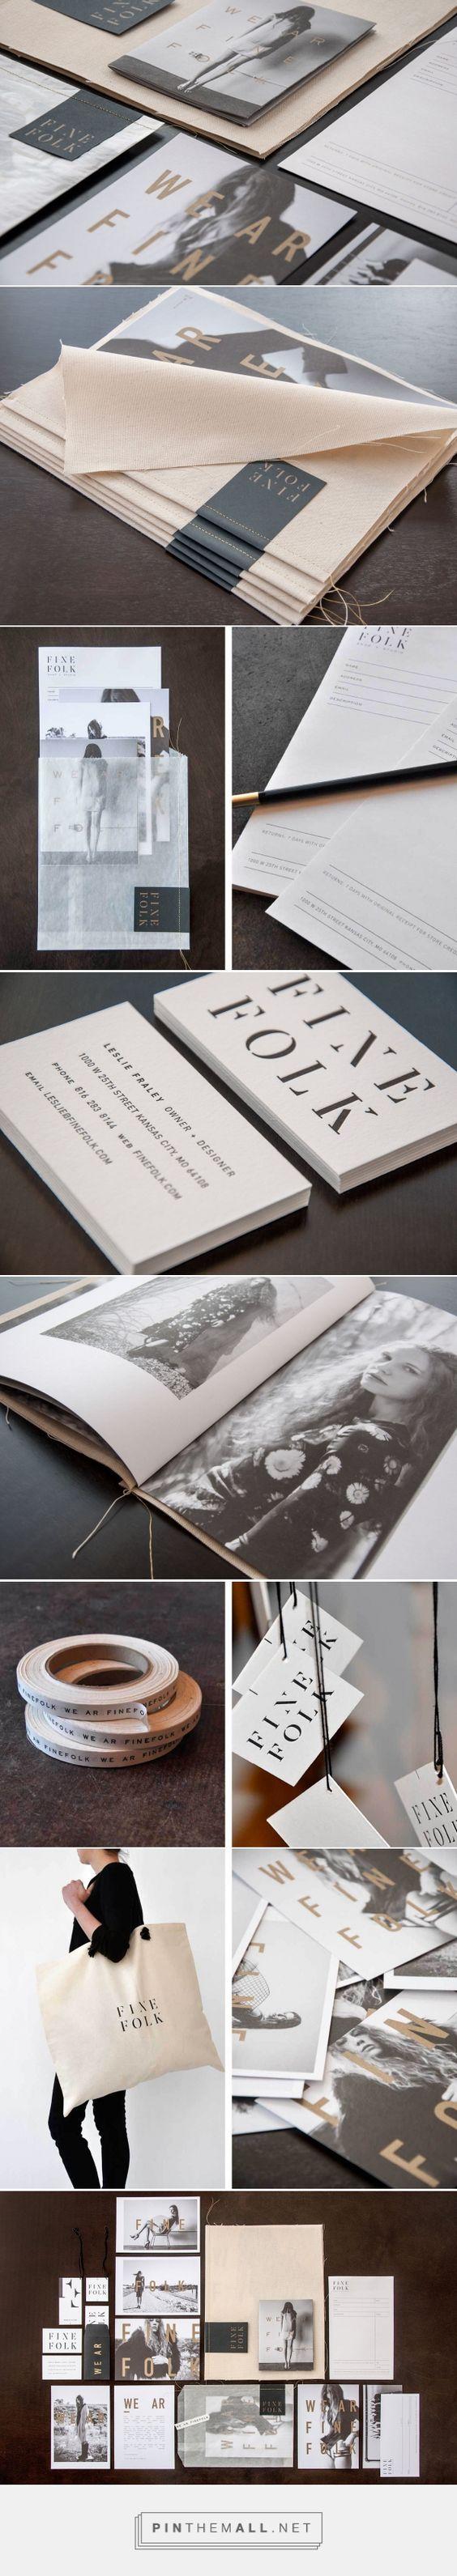 nice branding — Finefolk, by Design Ranch